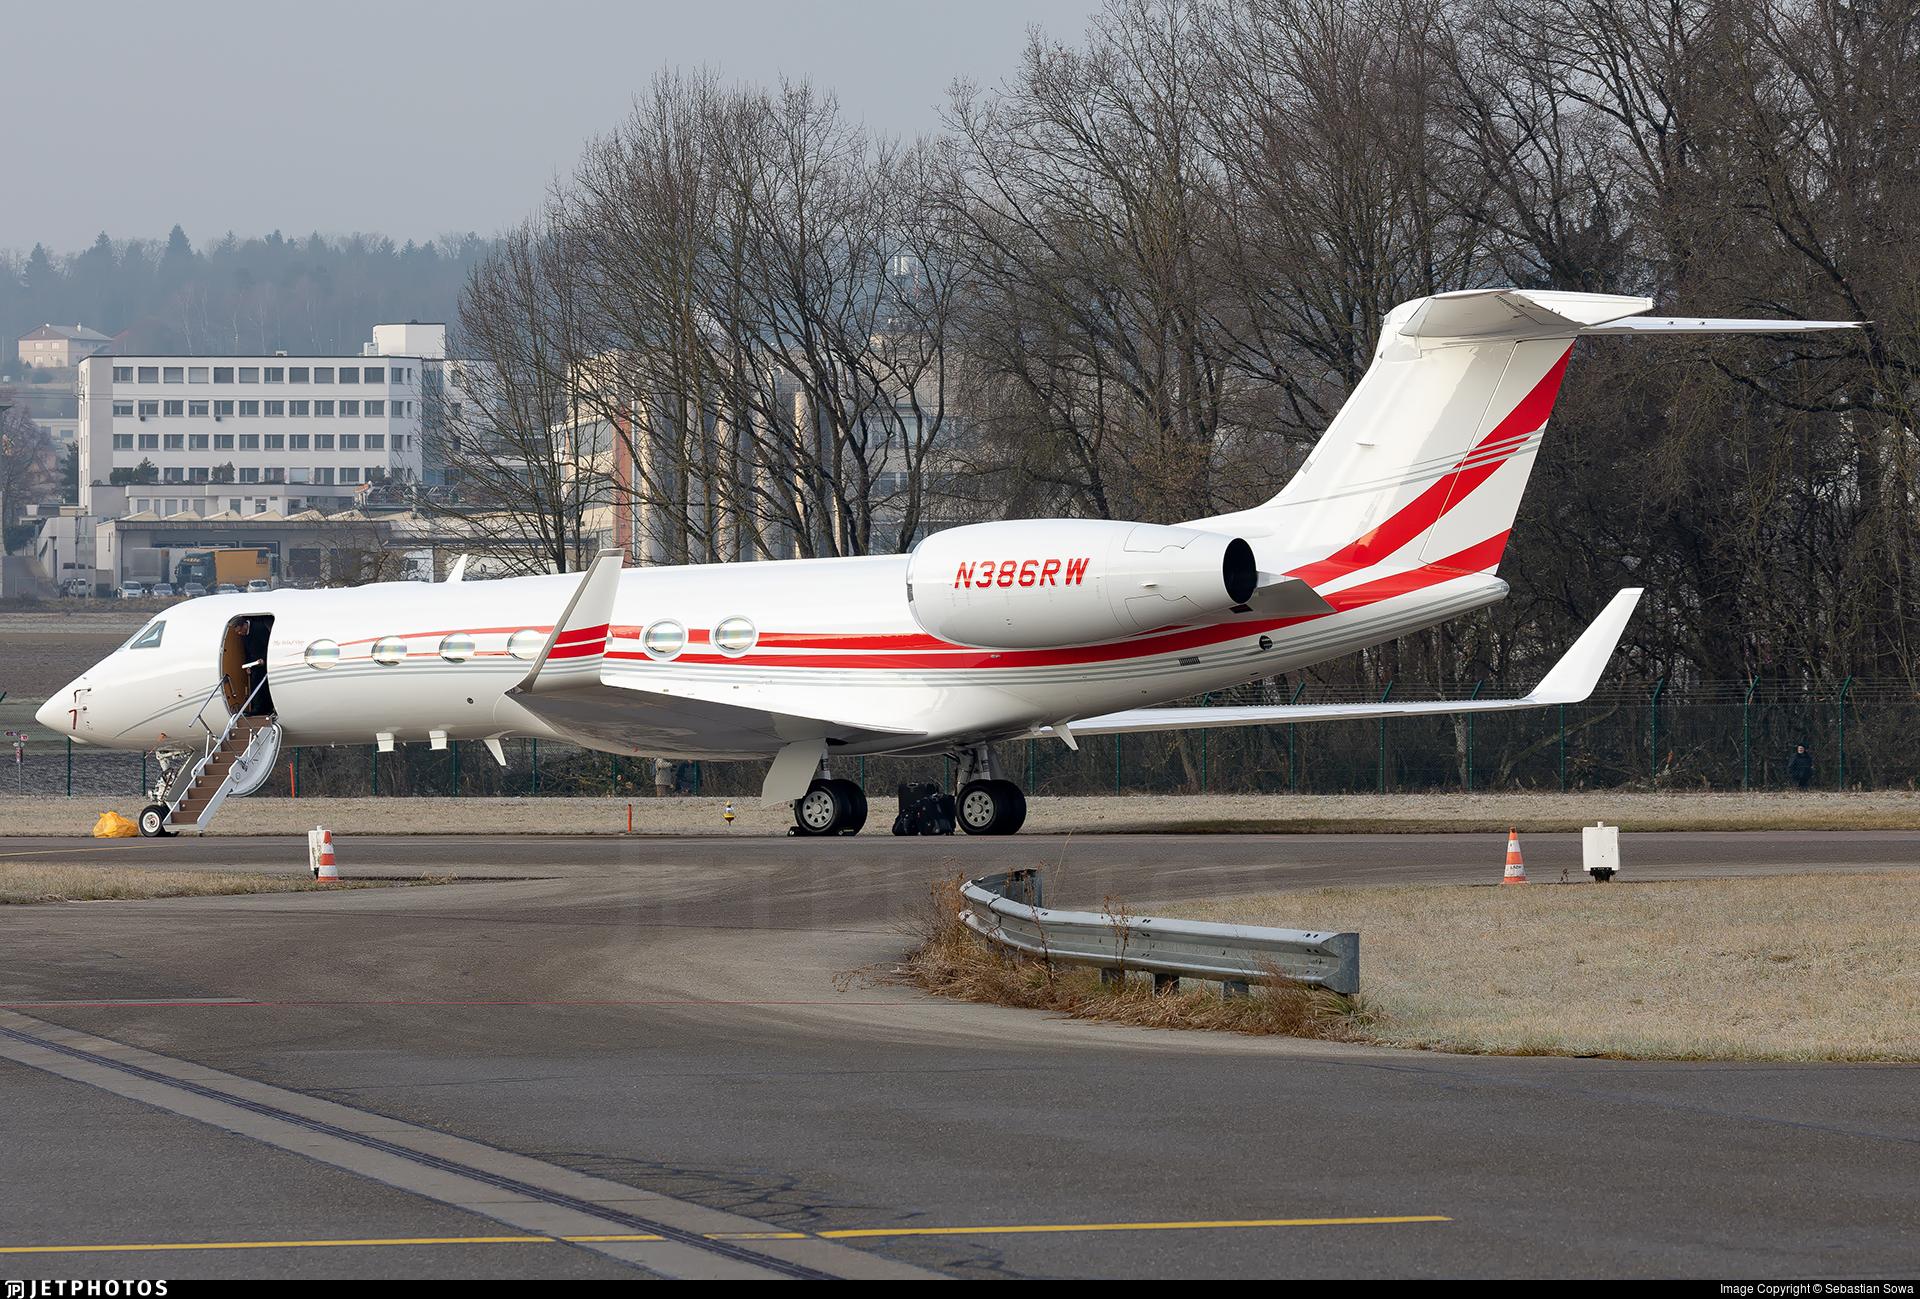 N386RW - Gulfstream G550 - Private